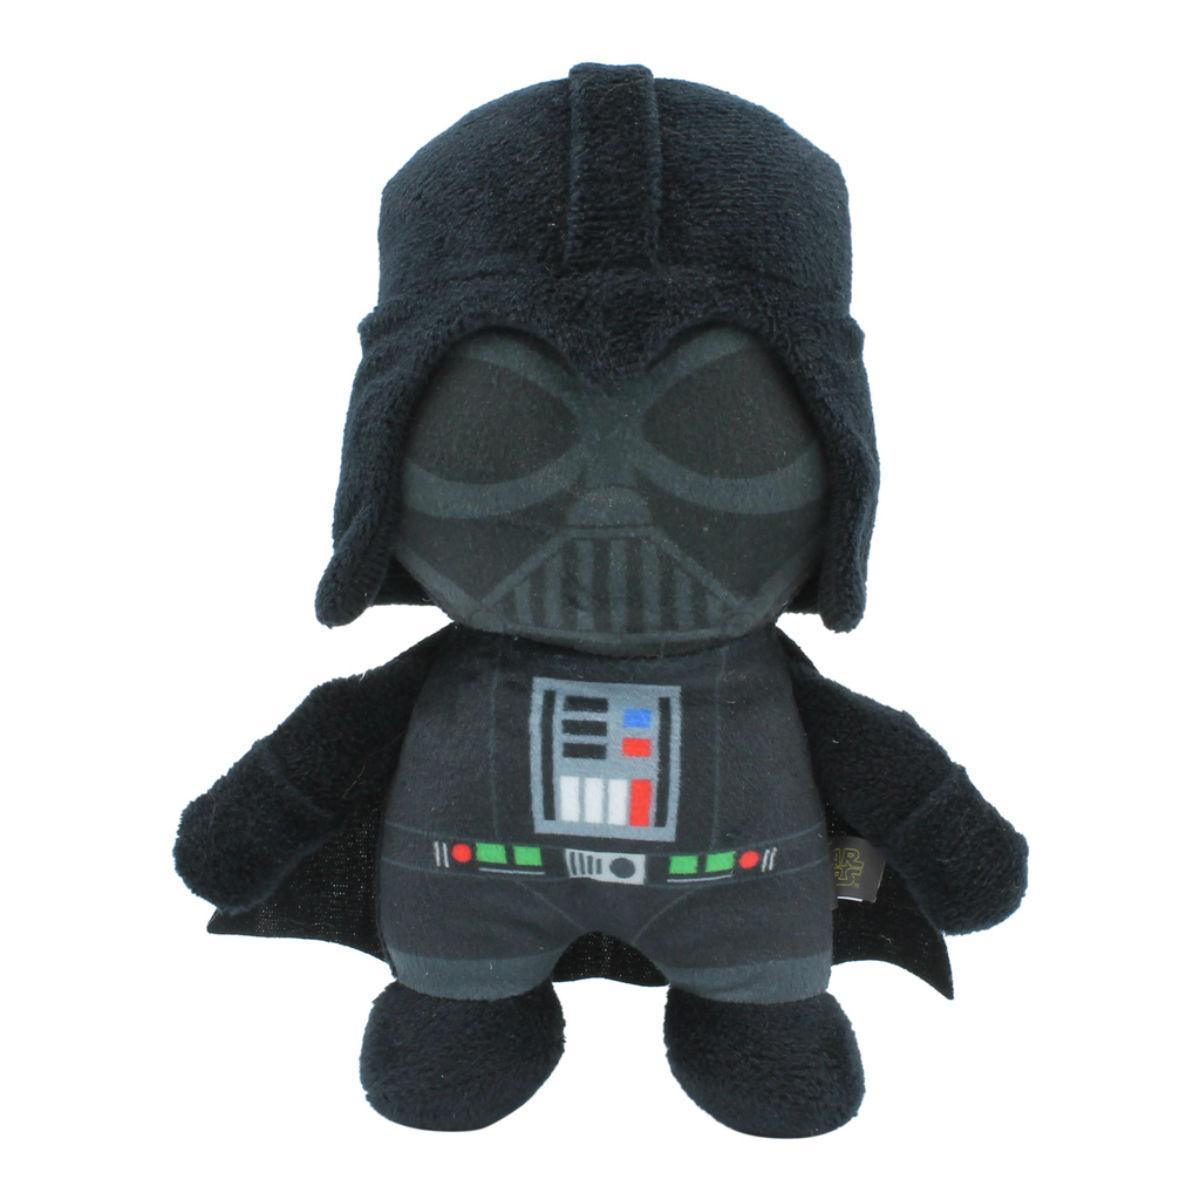 Star Wars Plush Dog Toy - Darth Vader